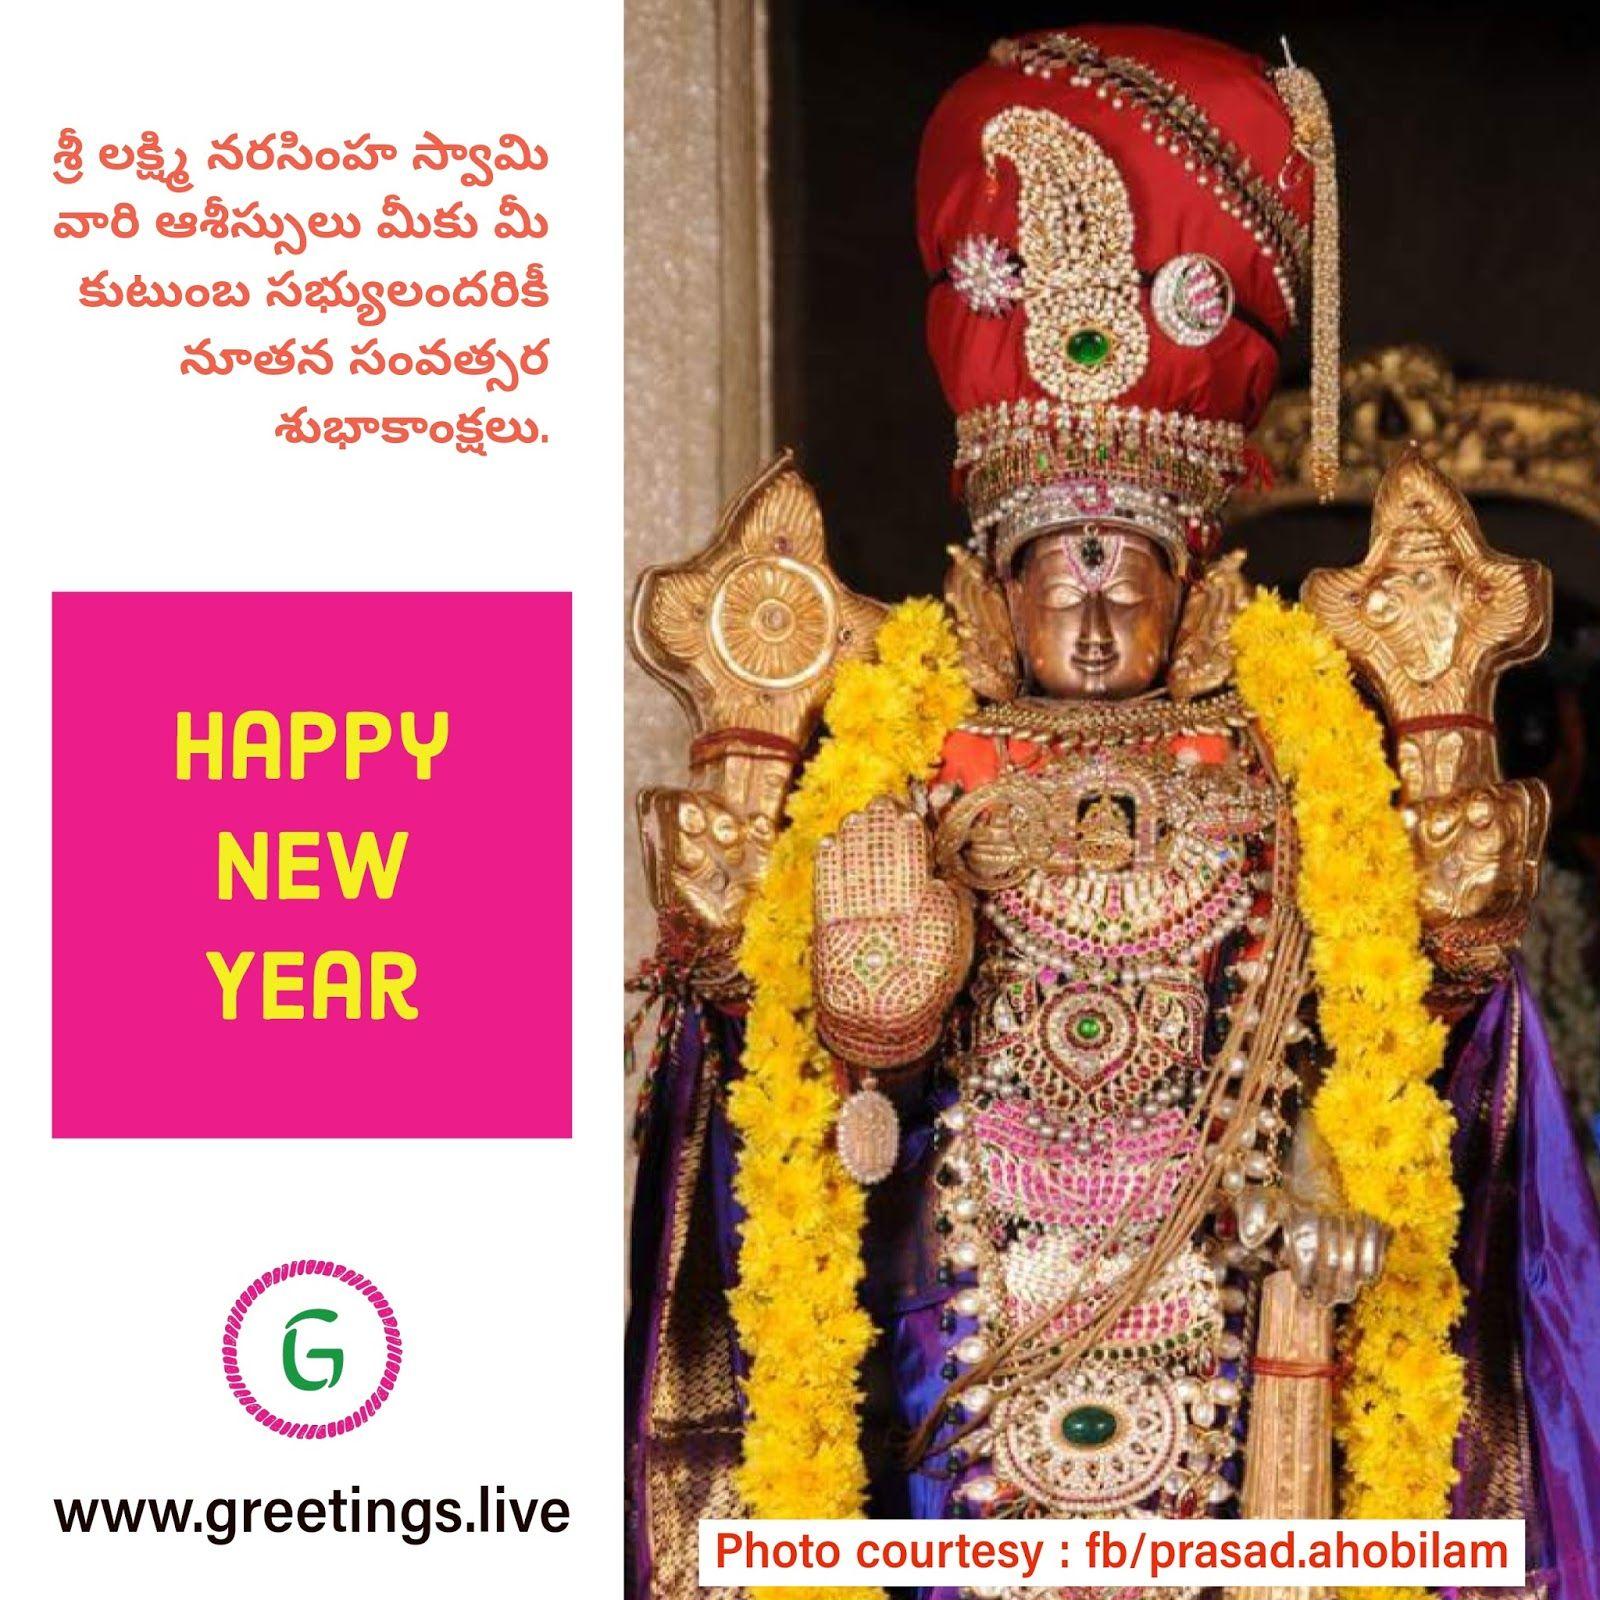 Lord sri lakshmi narasimha swamy new year greetings 2018 ahobilam lord sri lakshmi narasimha swamy new year greetings 2018 ahobilam temple devotional new year 2018 wishes in telugu languageage category hindu m4hsunfo